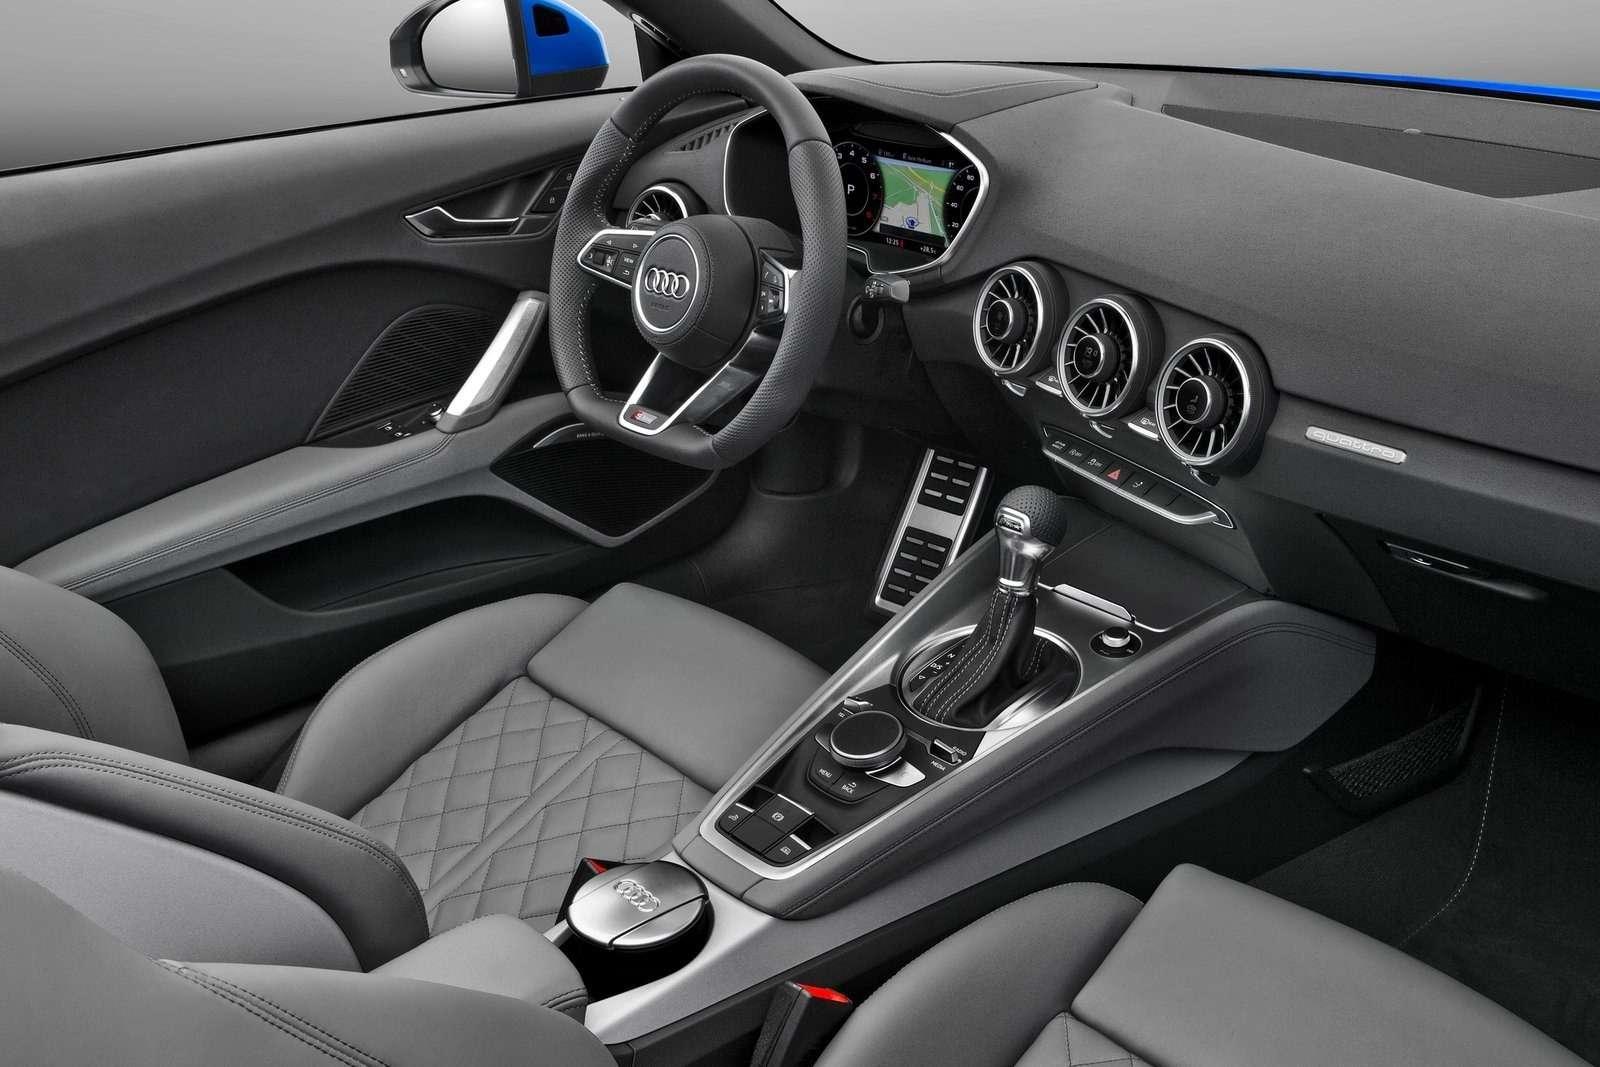 Audi-TT_Roadster_2015_1600x1200_wallpaper_35